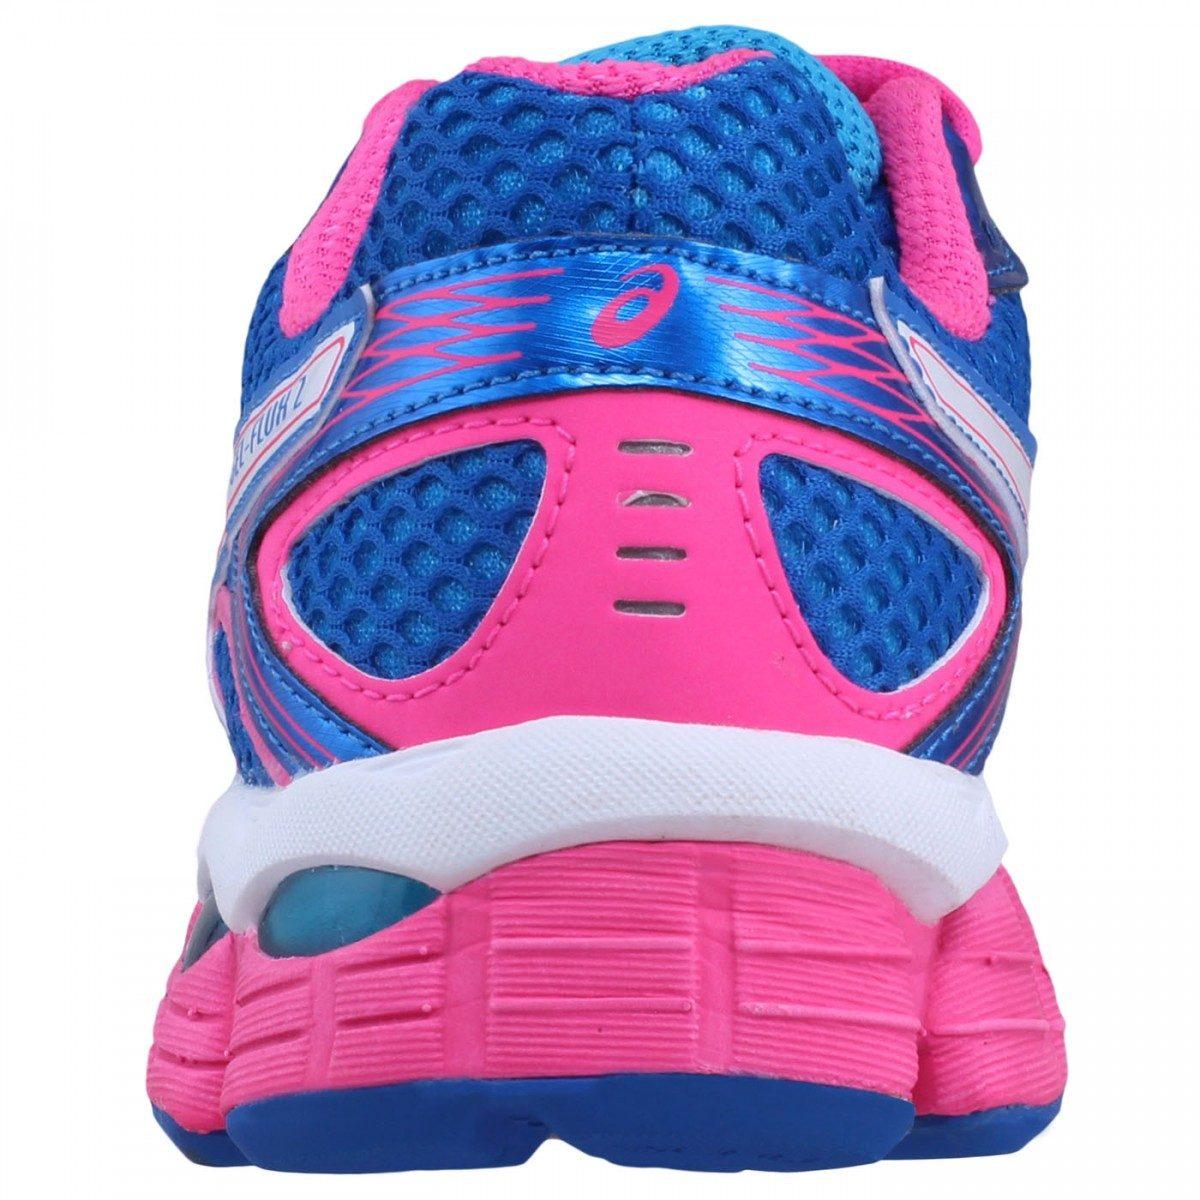 tenis asics feminino rosa colorido 2dab72b508484